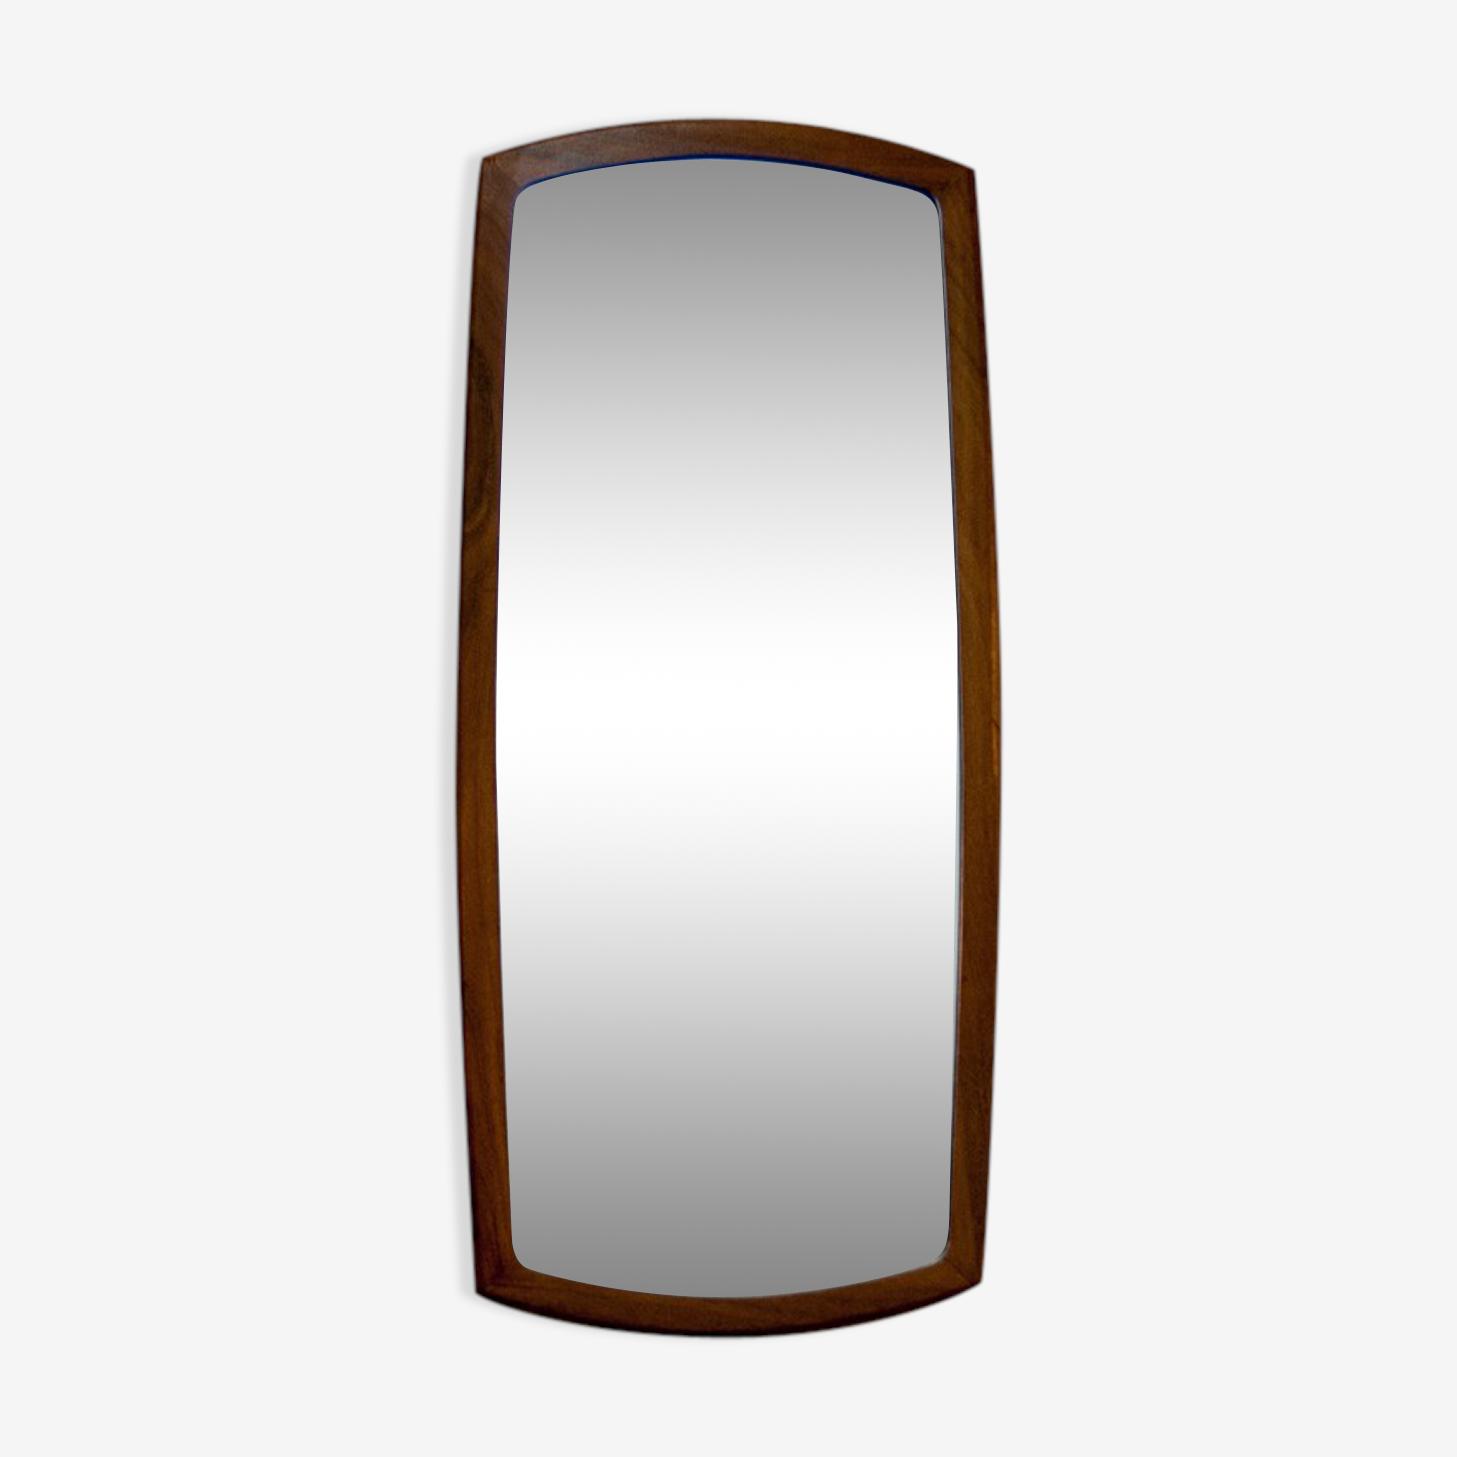 Flared Scandinavian mirror 79x36cmcm